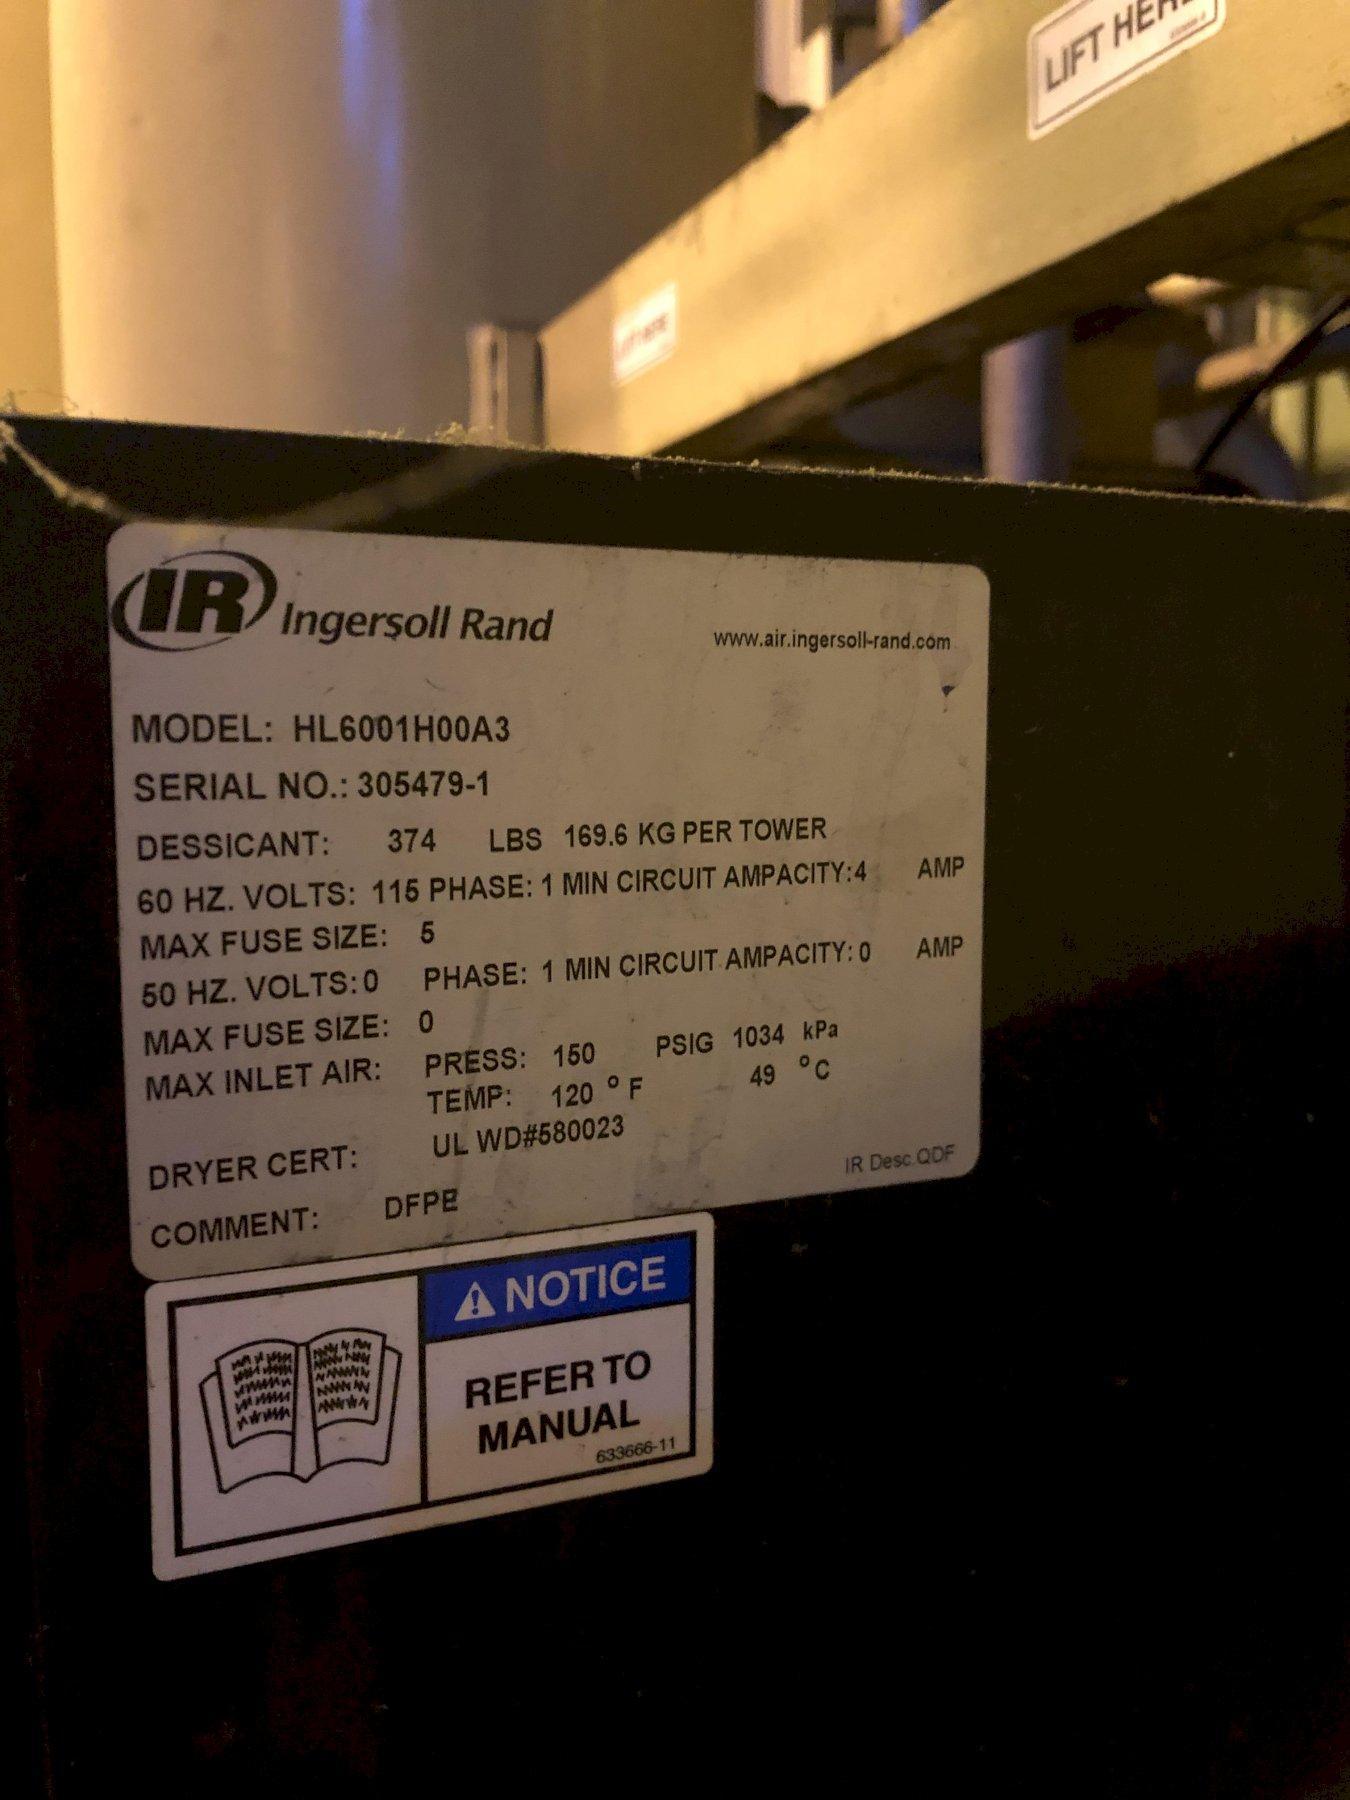 Ingersol Rand model h6001h00a3 desiccant air dryer s/n 305479-1